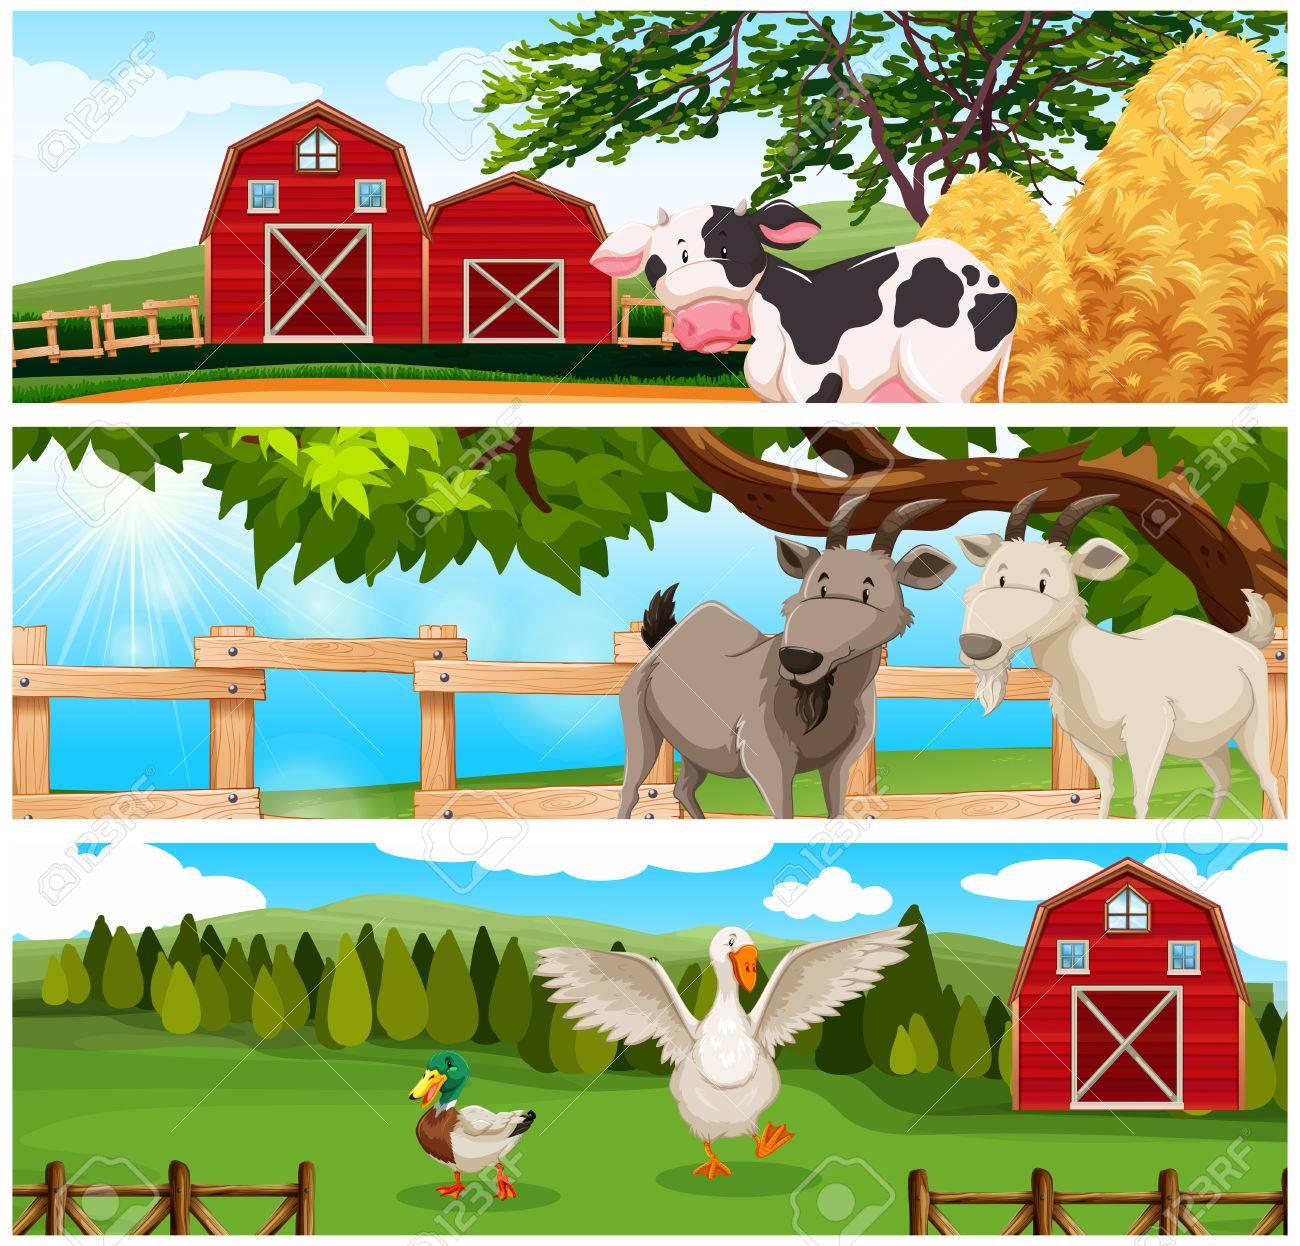 hight resolution of farm animals on the farmland illustration stock vector 48833509